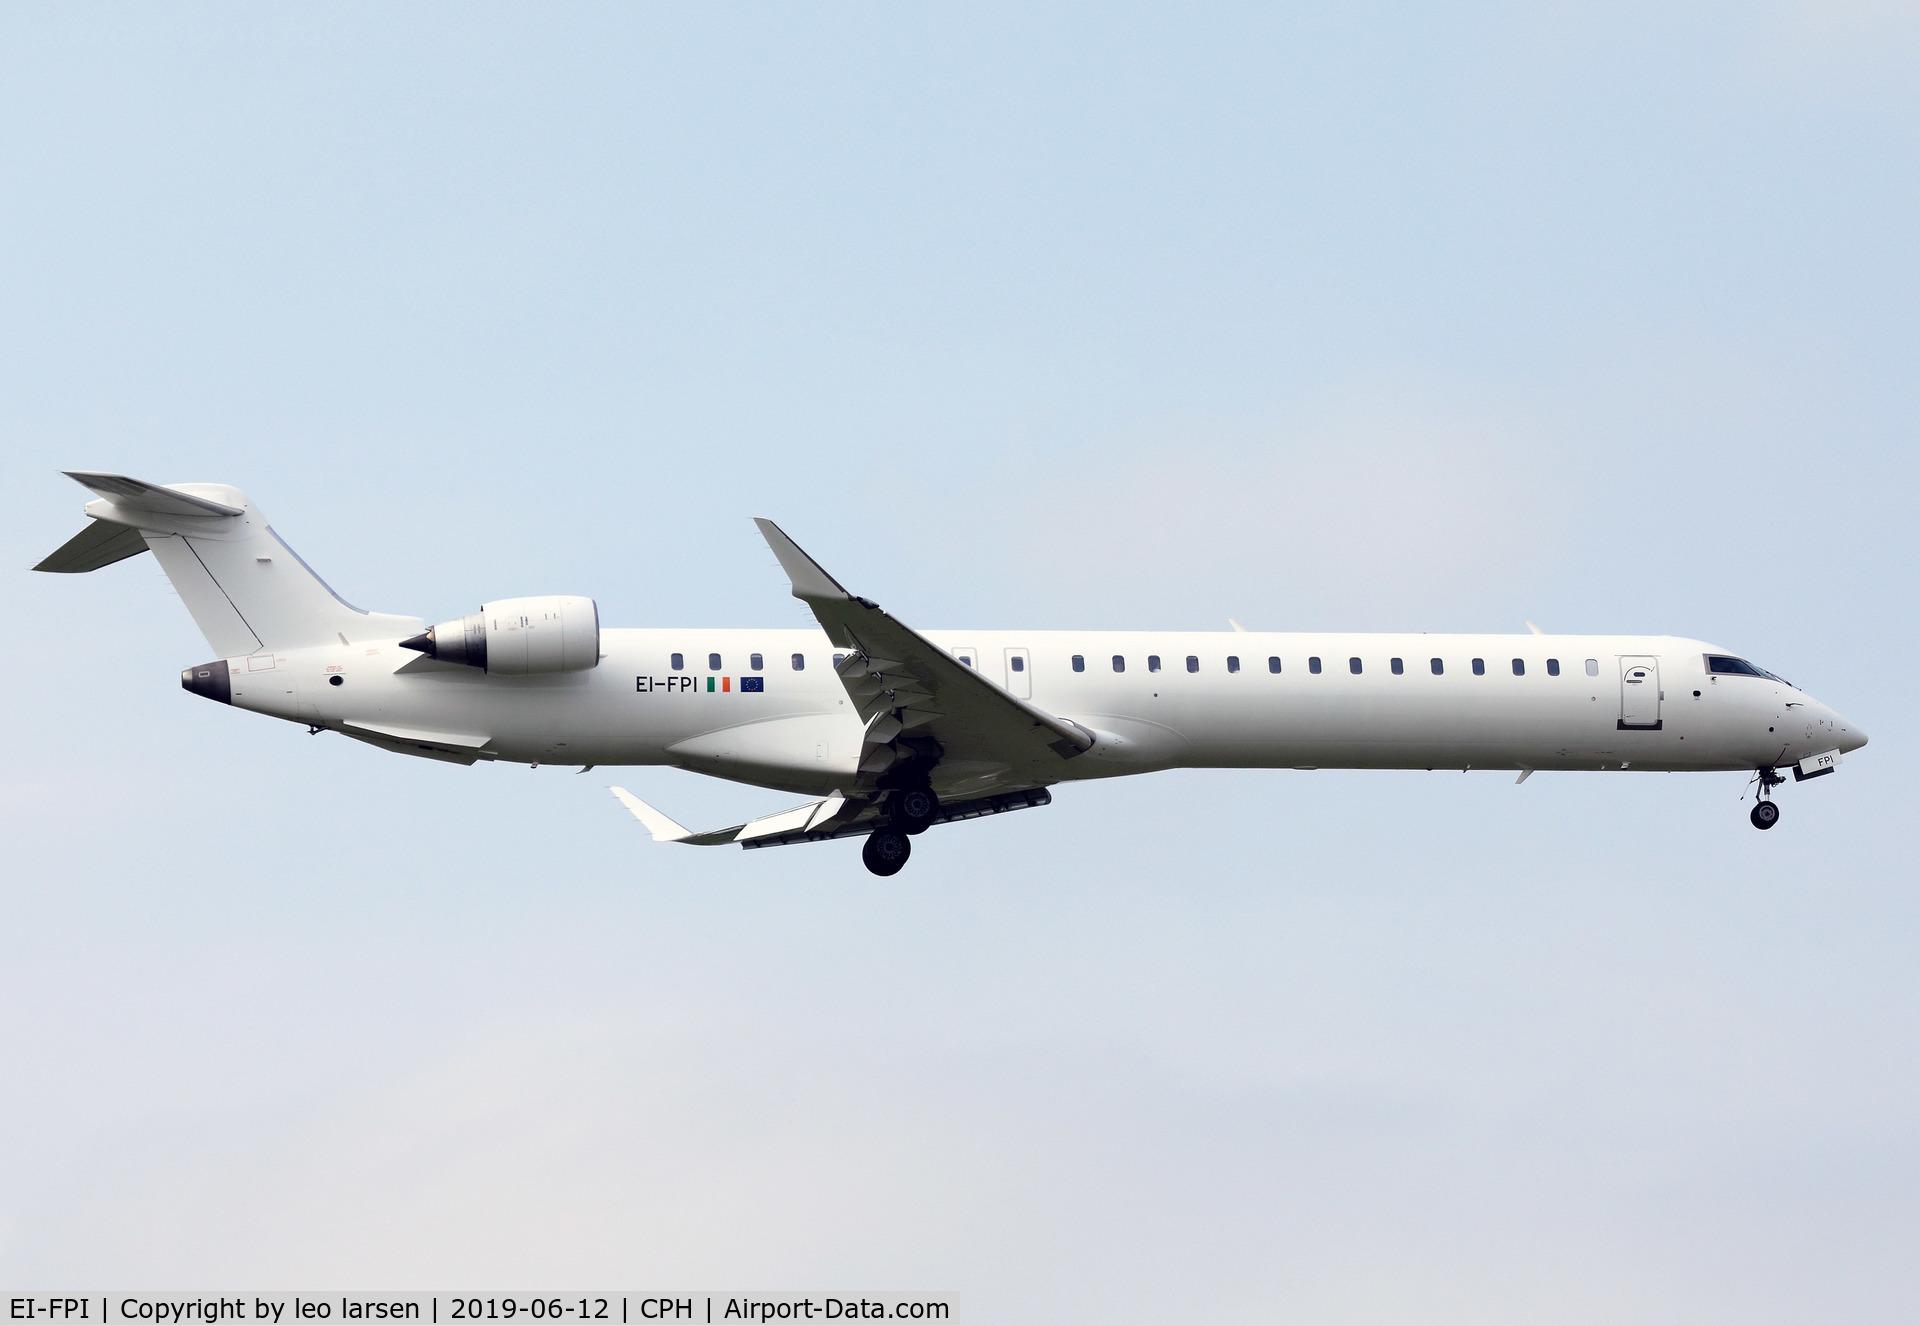 EI-FPI, 2016 Bombardier CRJ-900LR (CL-600-2D24) C/N 15425, Copenhagen 12.6.2019